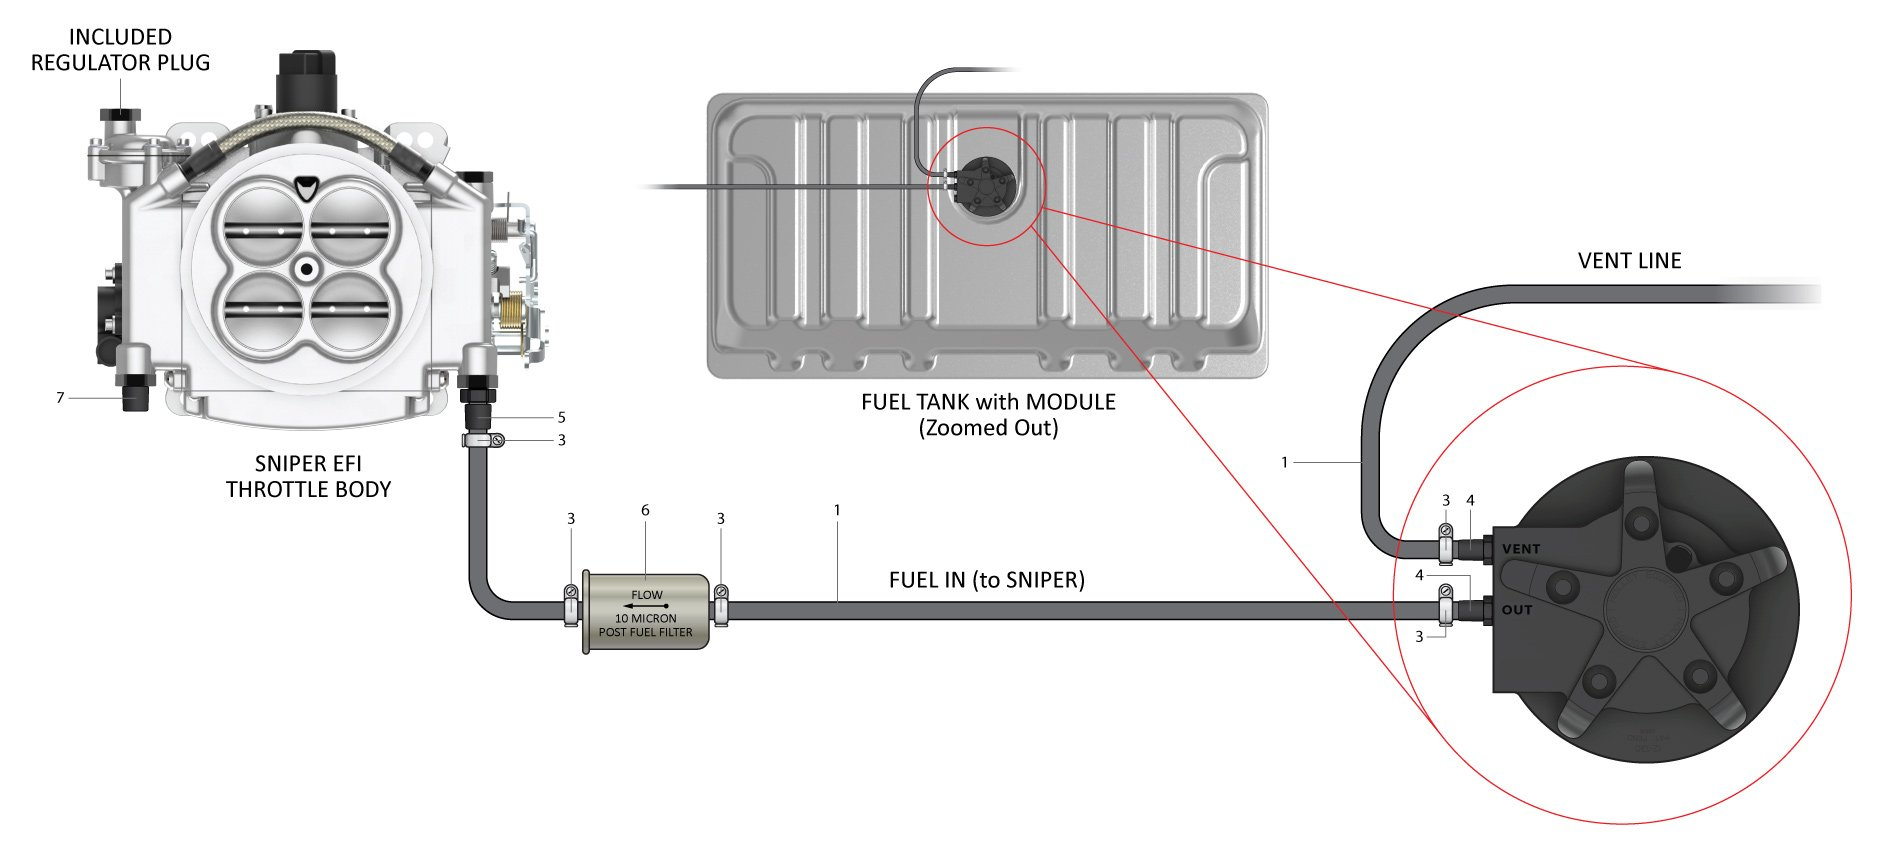 images?q=tbn:ANd9GcQh_l3eQ5xwiPy07kGEXjmjgmBKBRB7H2mRxCGhv1tFWg5c_mWT Holley Sniper Fuel Pump Relay Wiring Diagram